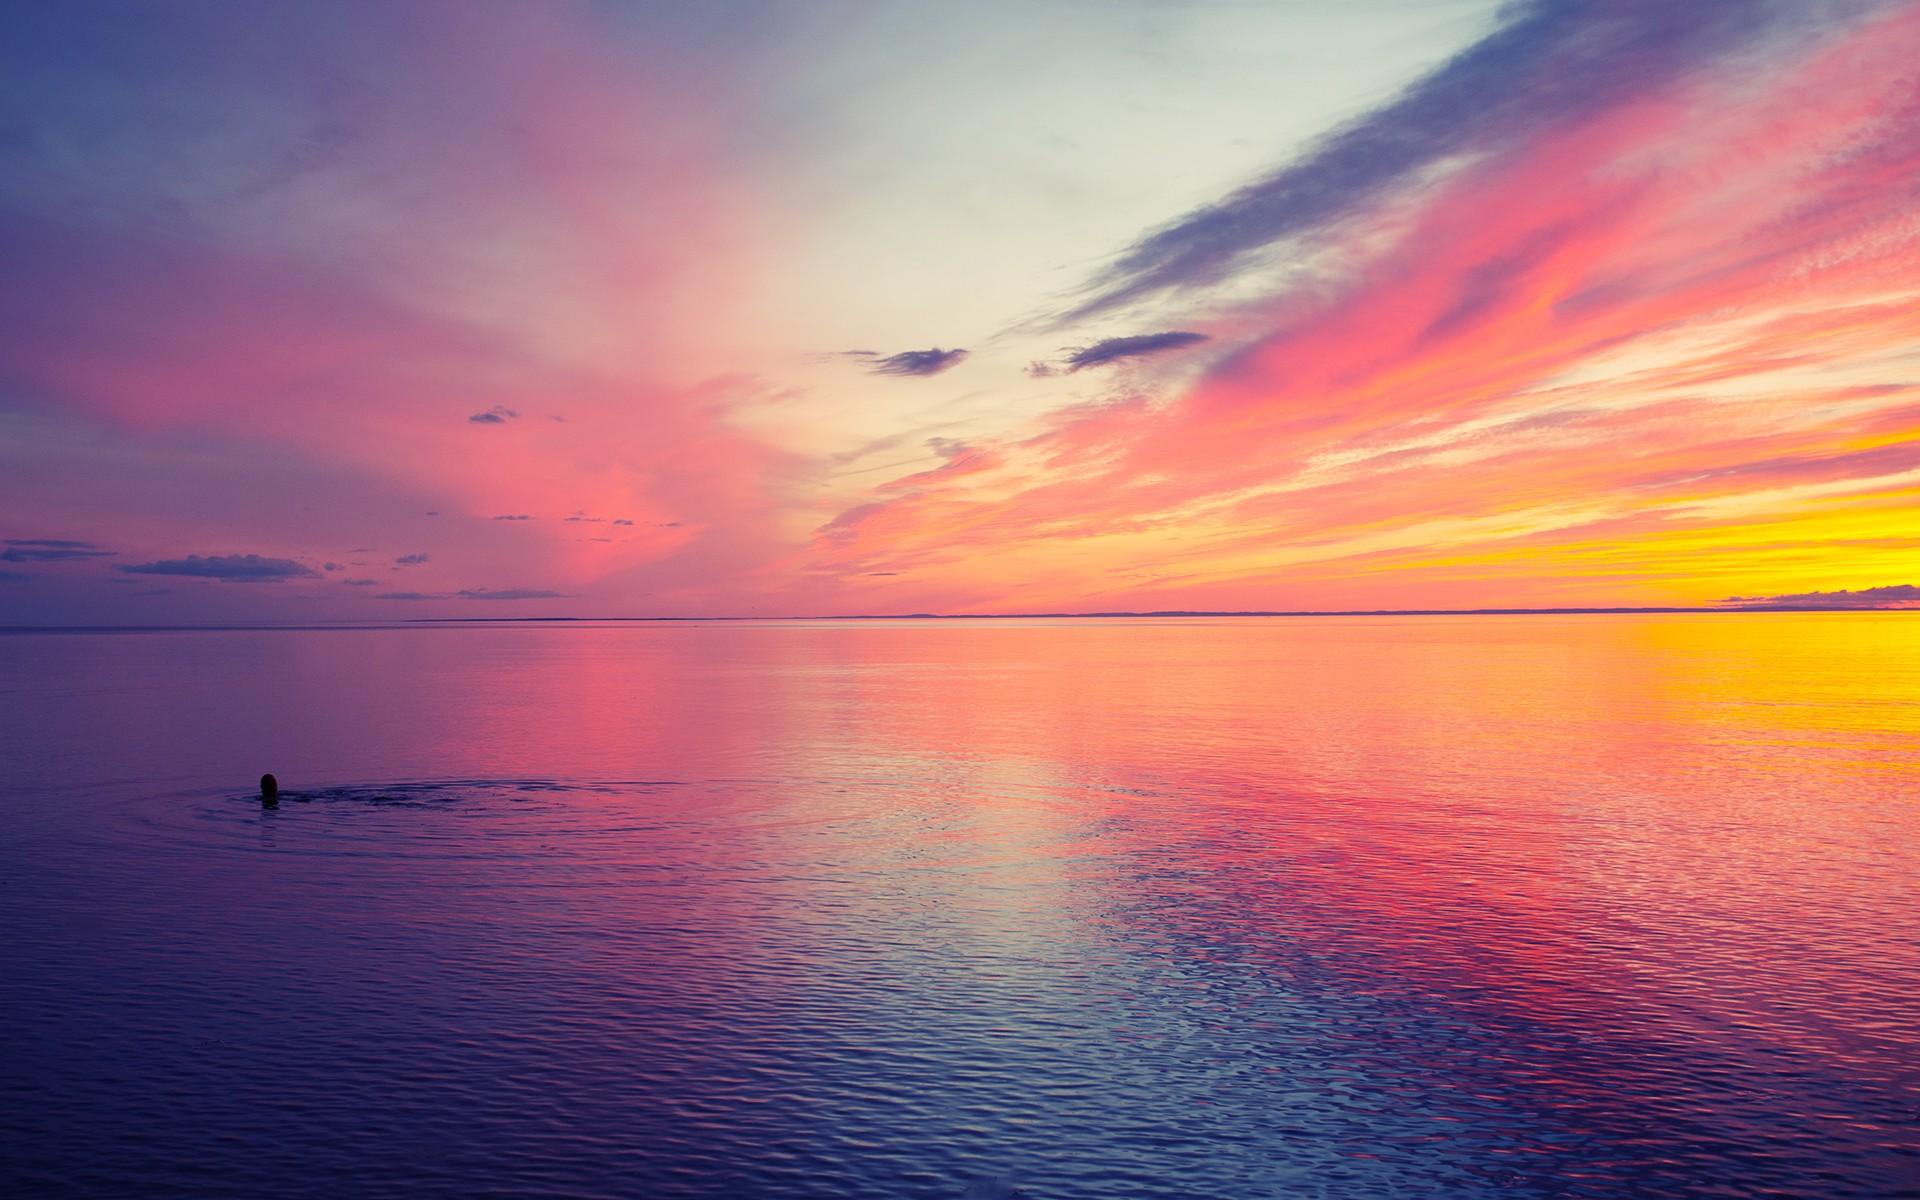 Beautiful Sunset at Sea wallpapers Beautiful Sunset at Sea stock 1920x1200